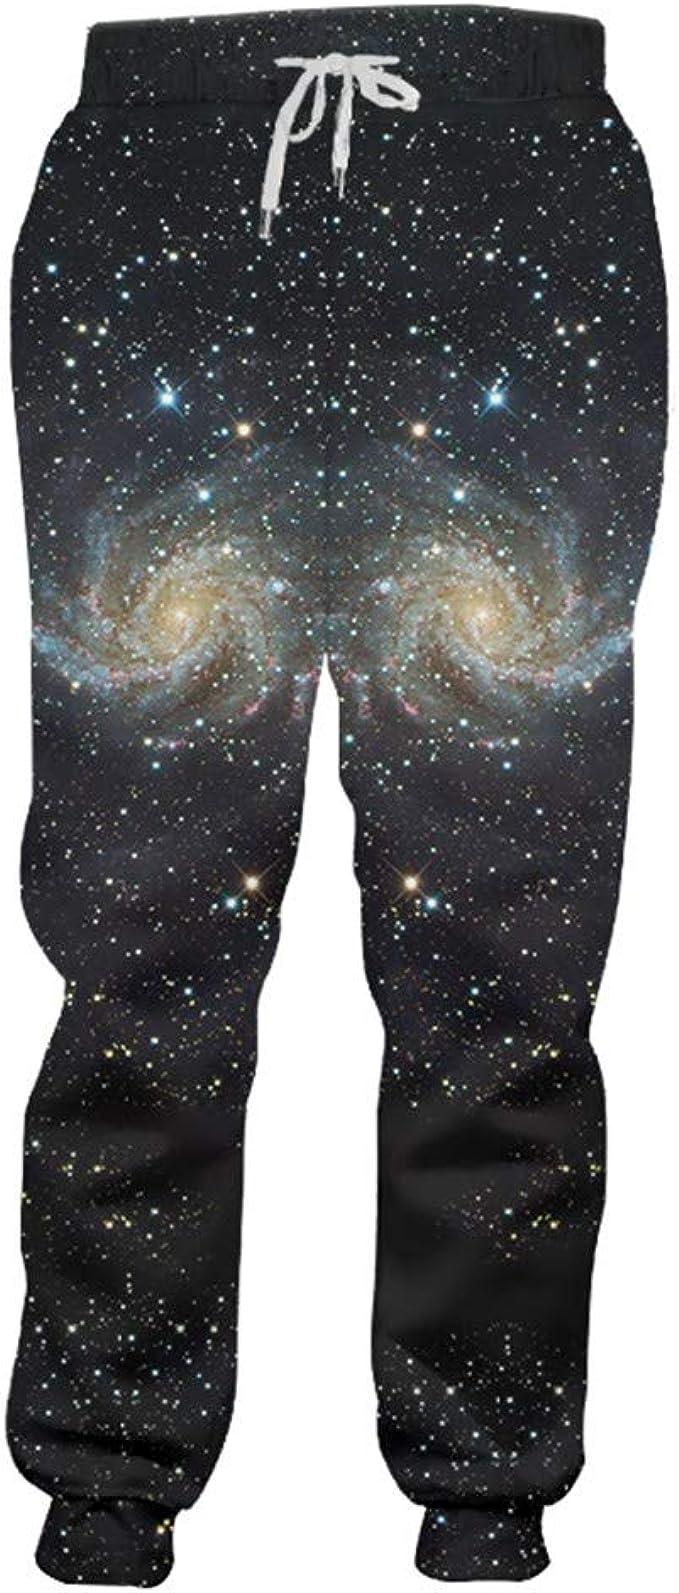 Pantalones chándal Moda Pantalones chándal 3D Impresión gráfica ...